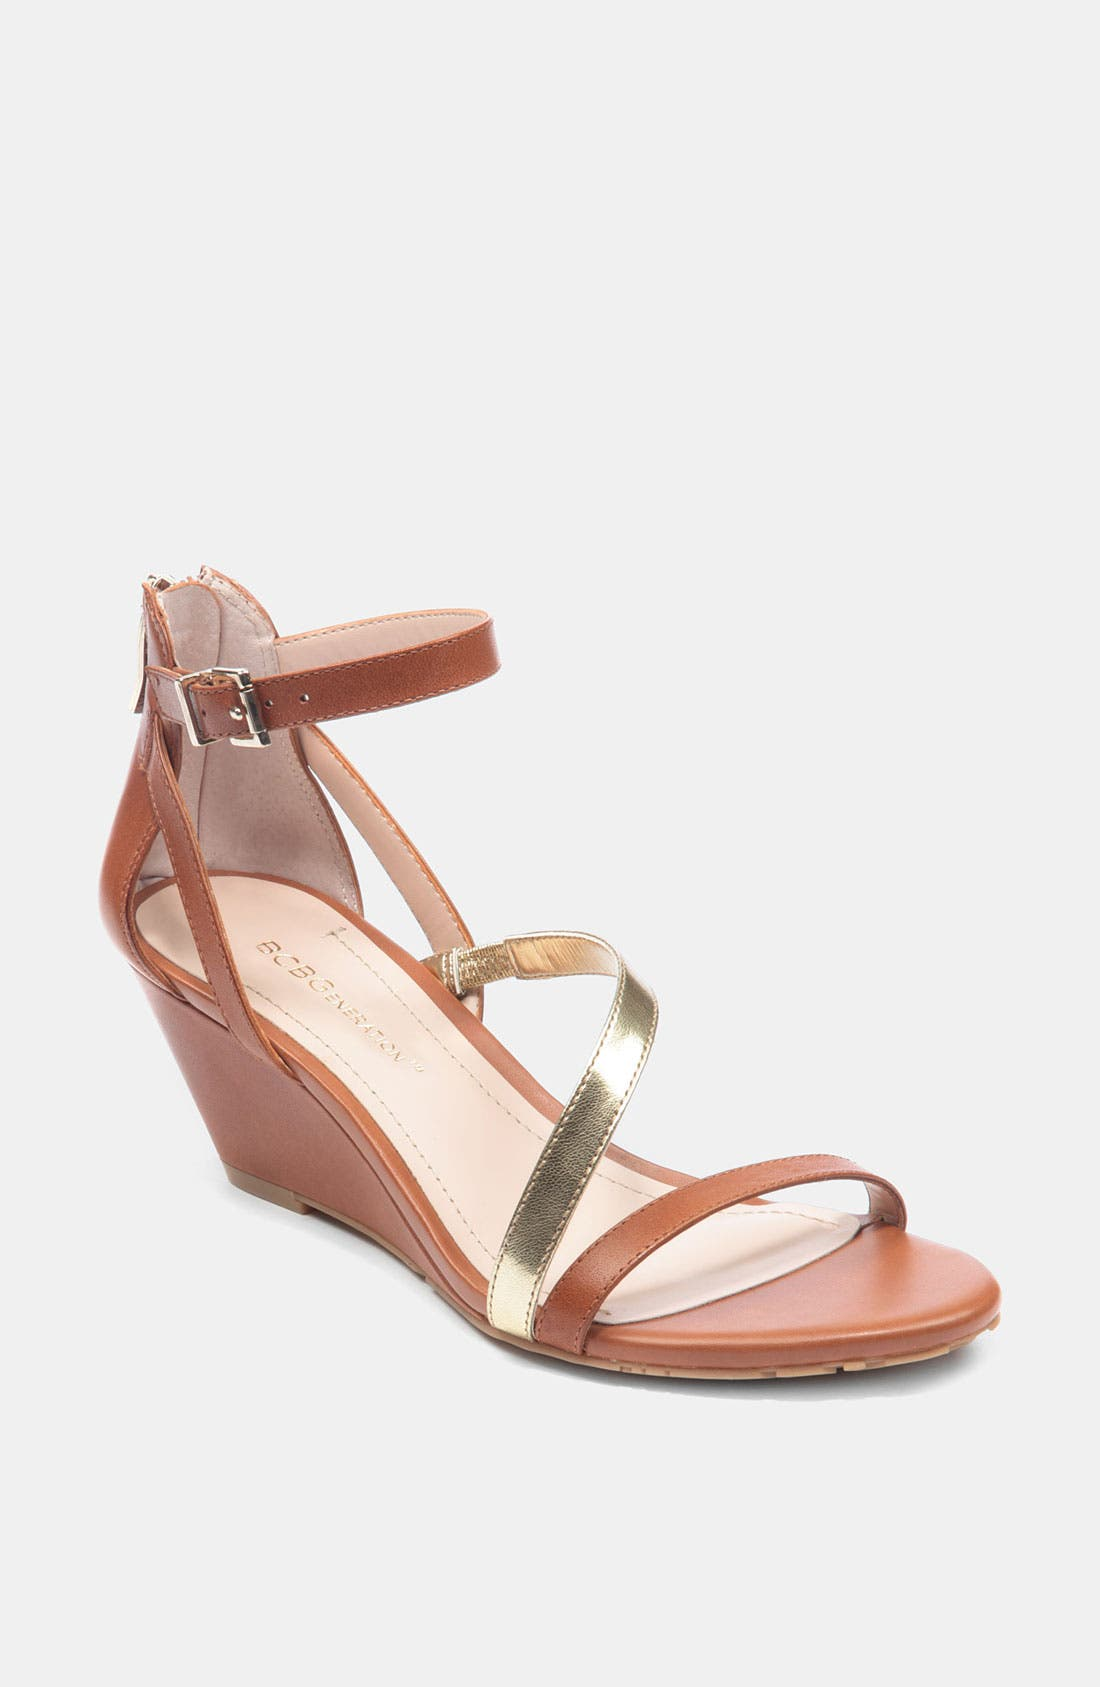 Main Image - BCBGeneration 'Vernna' Sandal